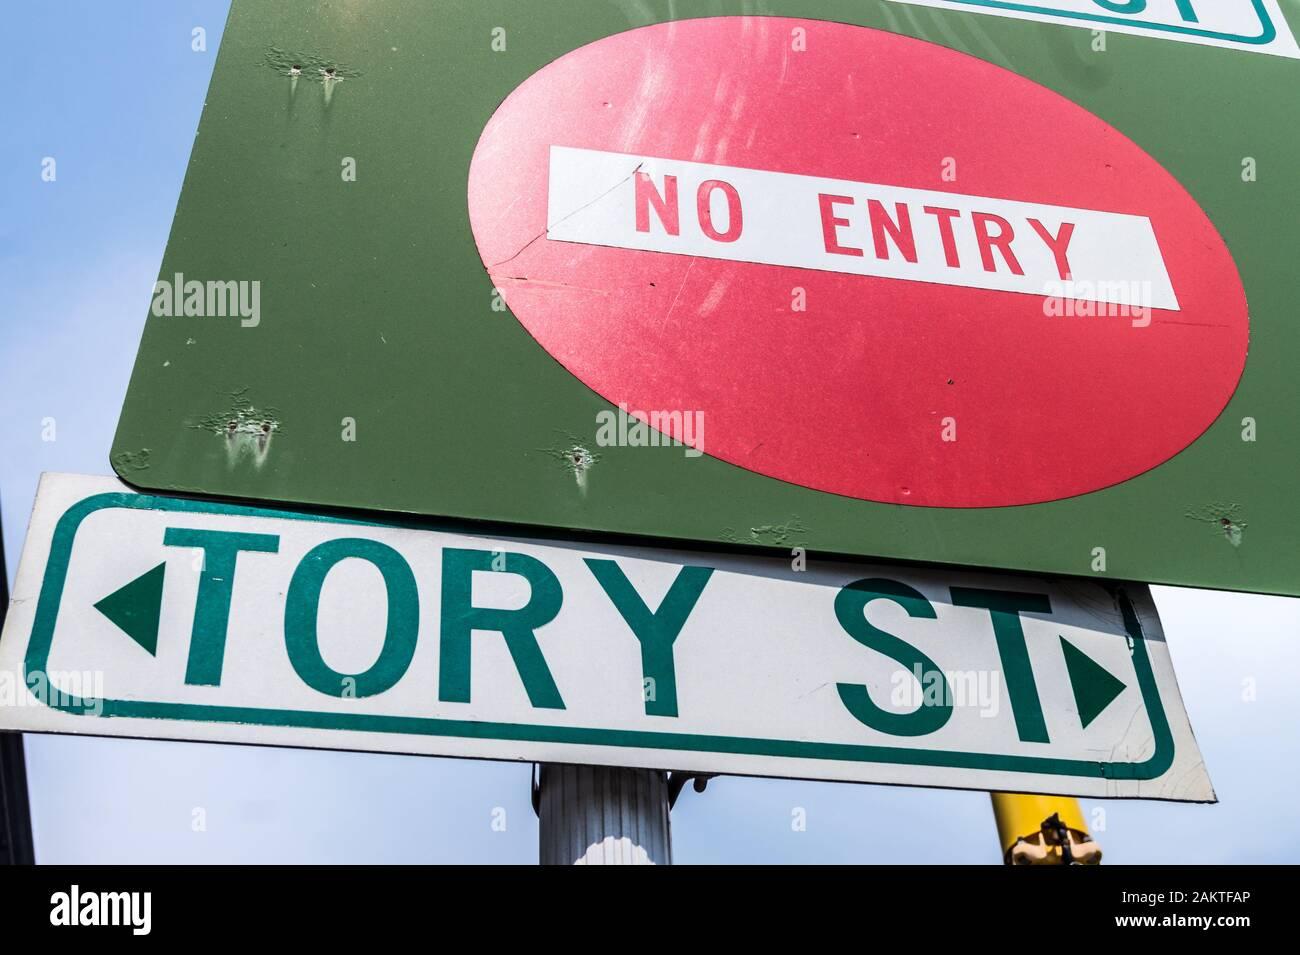 no-entry-street-sign-tory-street-te-aro-wellington-new-zealand-2AKTFAP.jpg